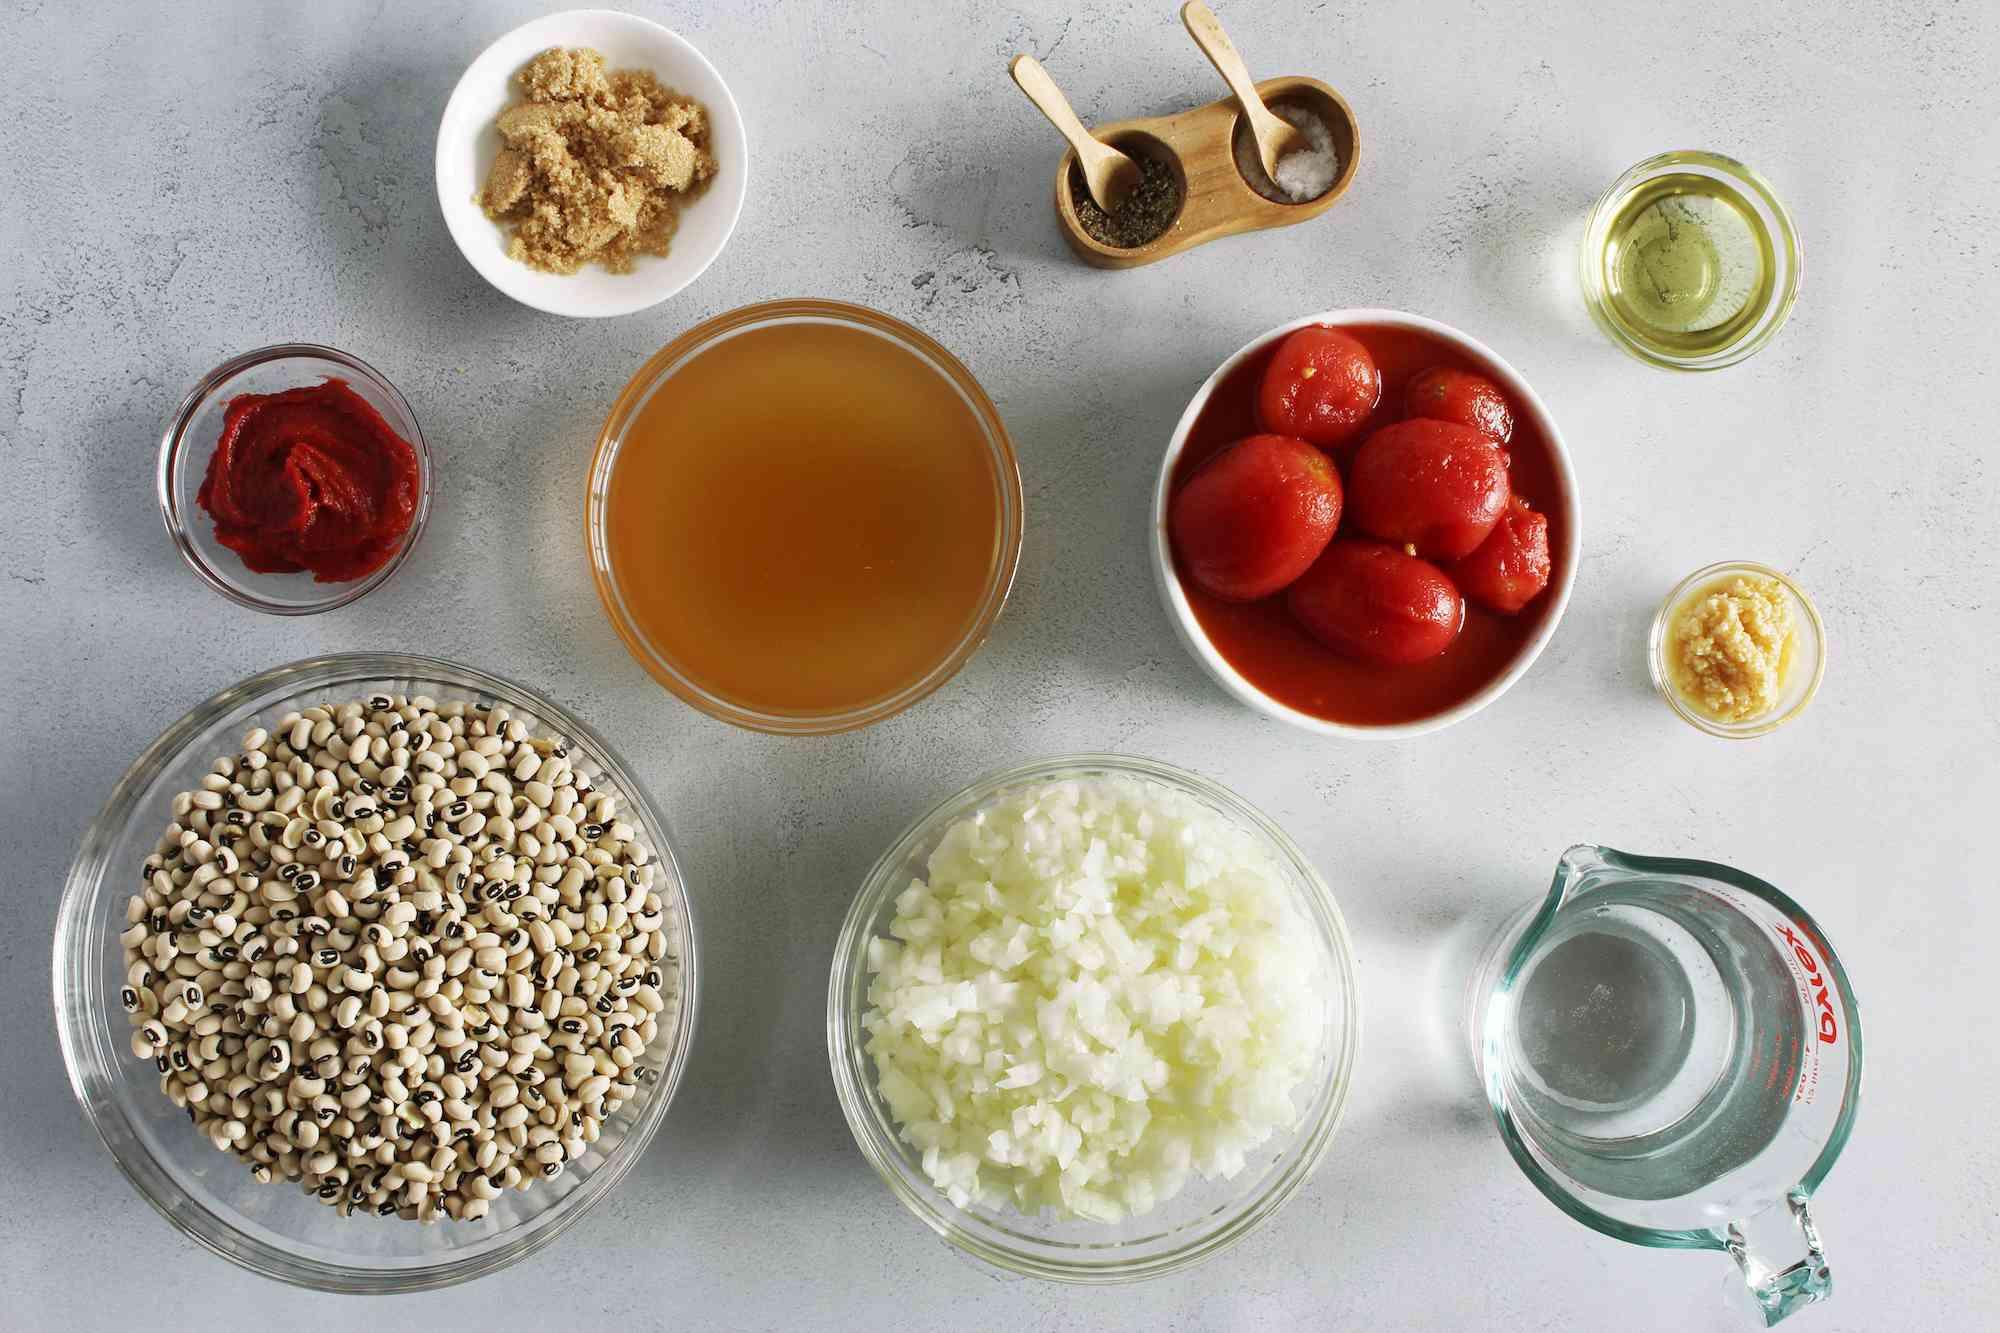 Ingredients for vegan black-eyed peas